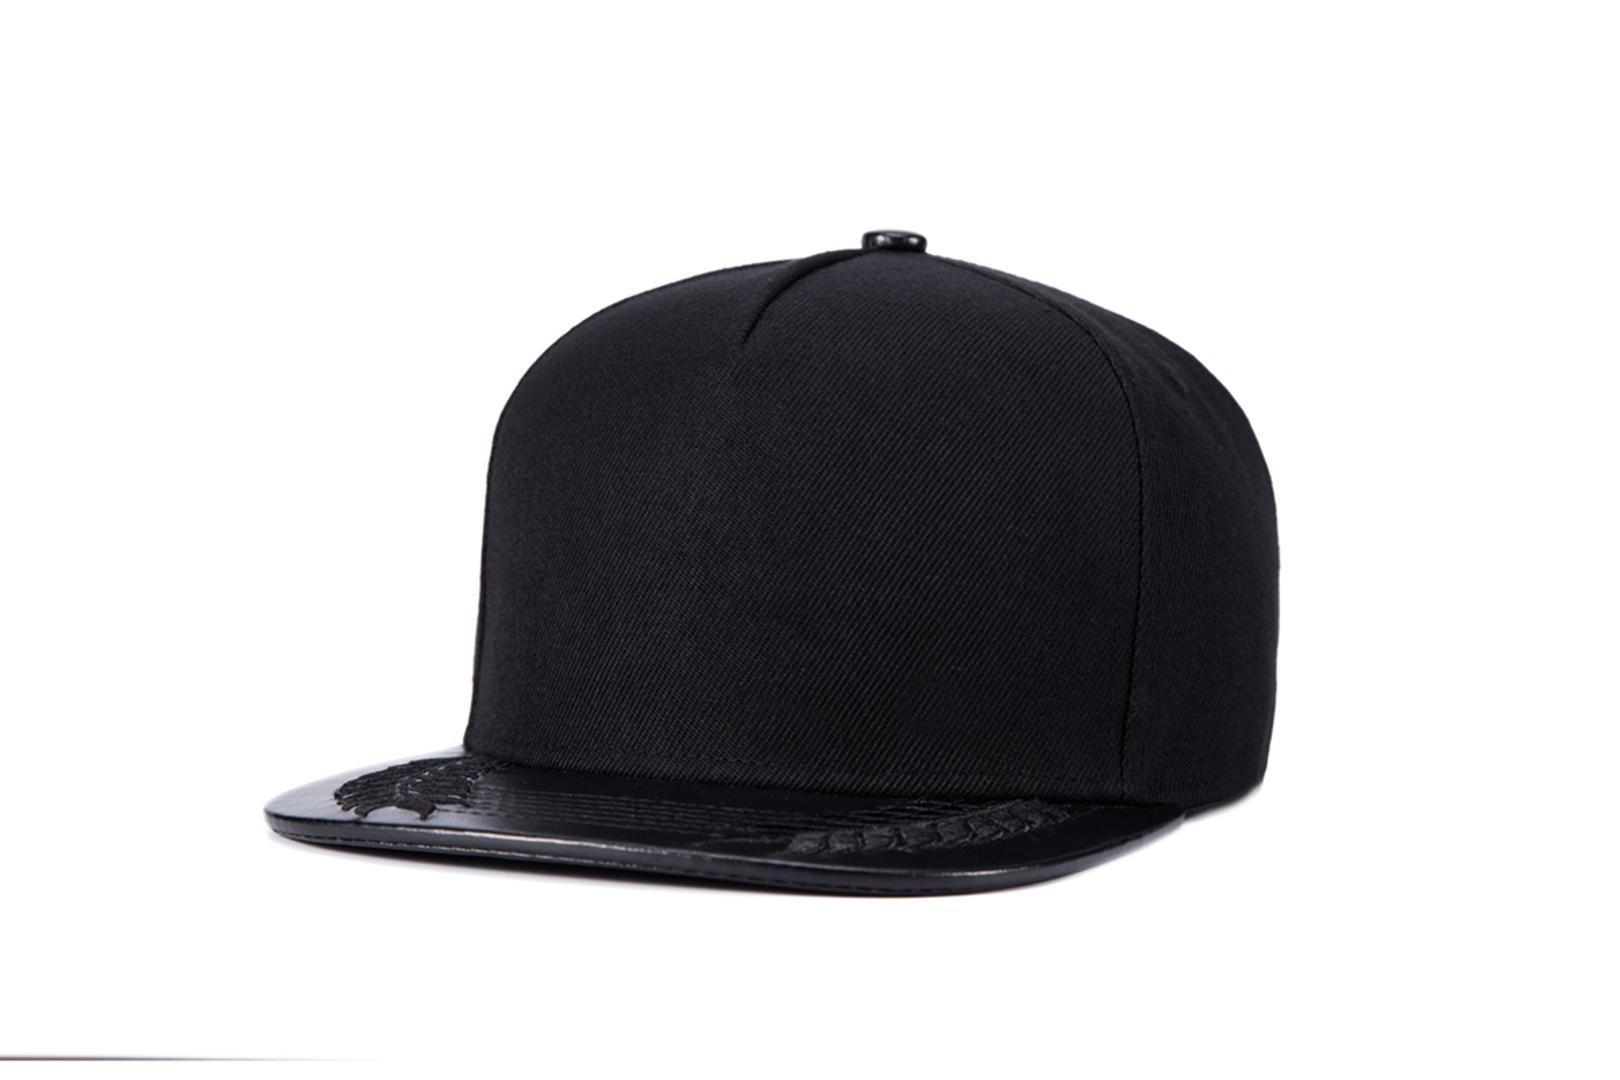 2018 Gorras Planas Hot style Flower Print flat top hat baseball cap Hip Hop  Cap hat for man Swag Mens Snapbacks Black.